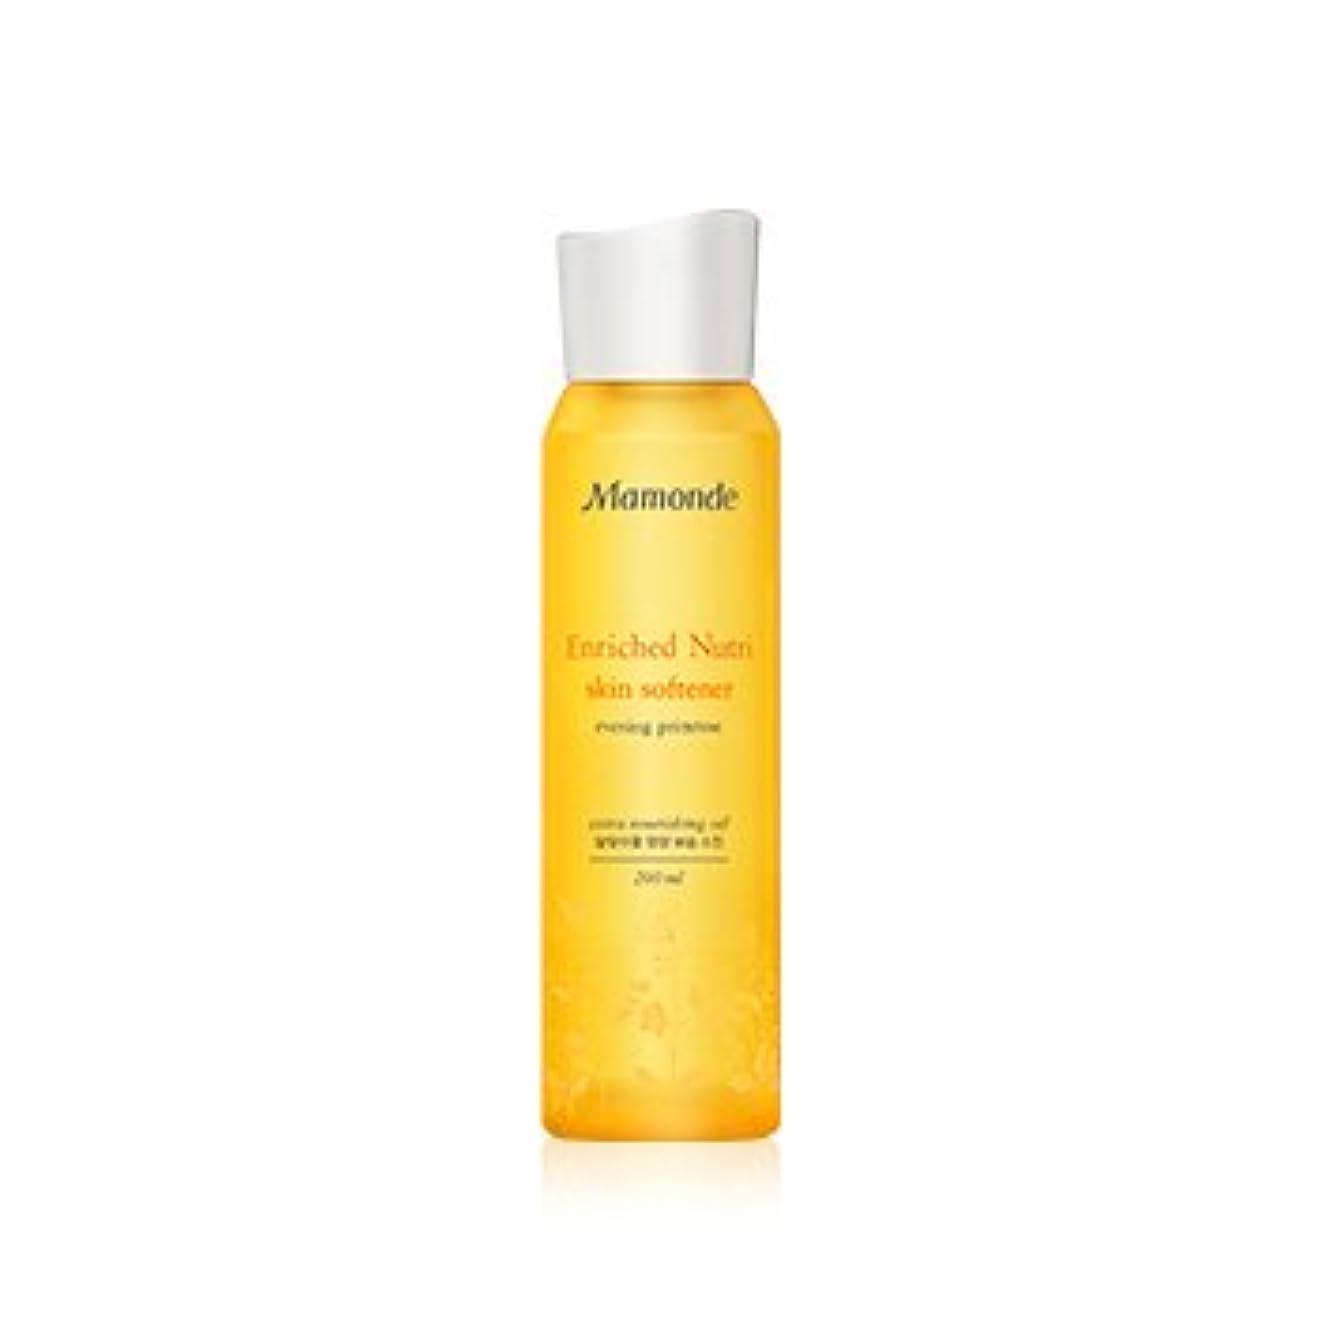 [New] Mamonde Enriched Nutri Skin Softener 200ml/マモンド エンリッチド ニュートリ スキン ソフナー 200ml